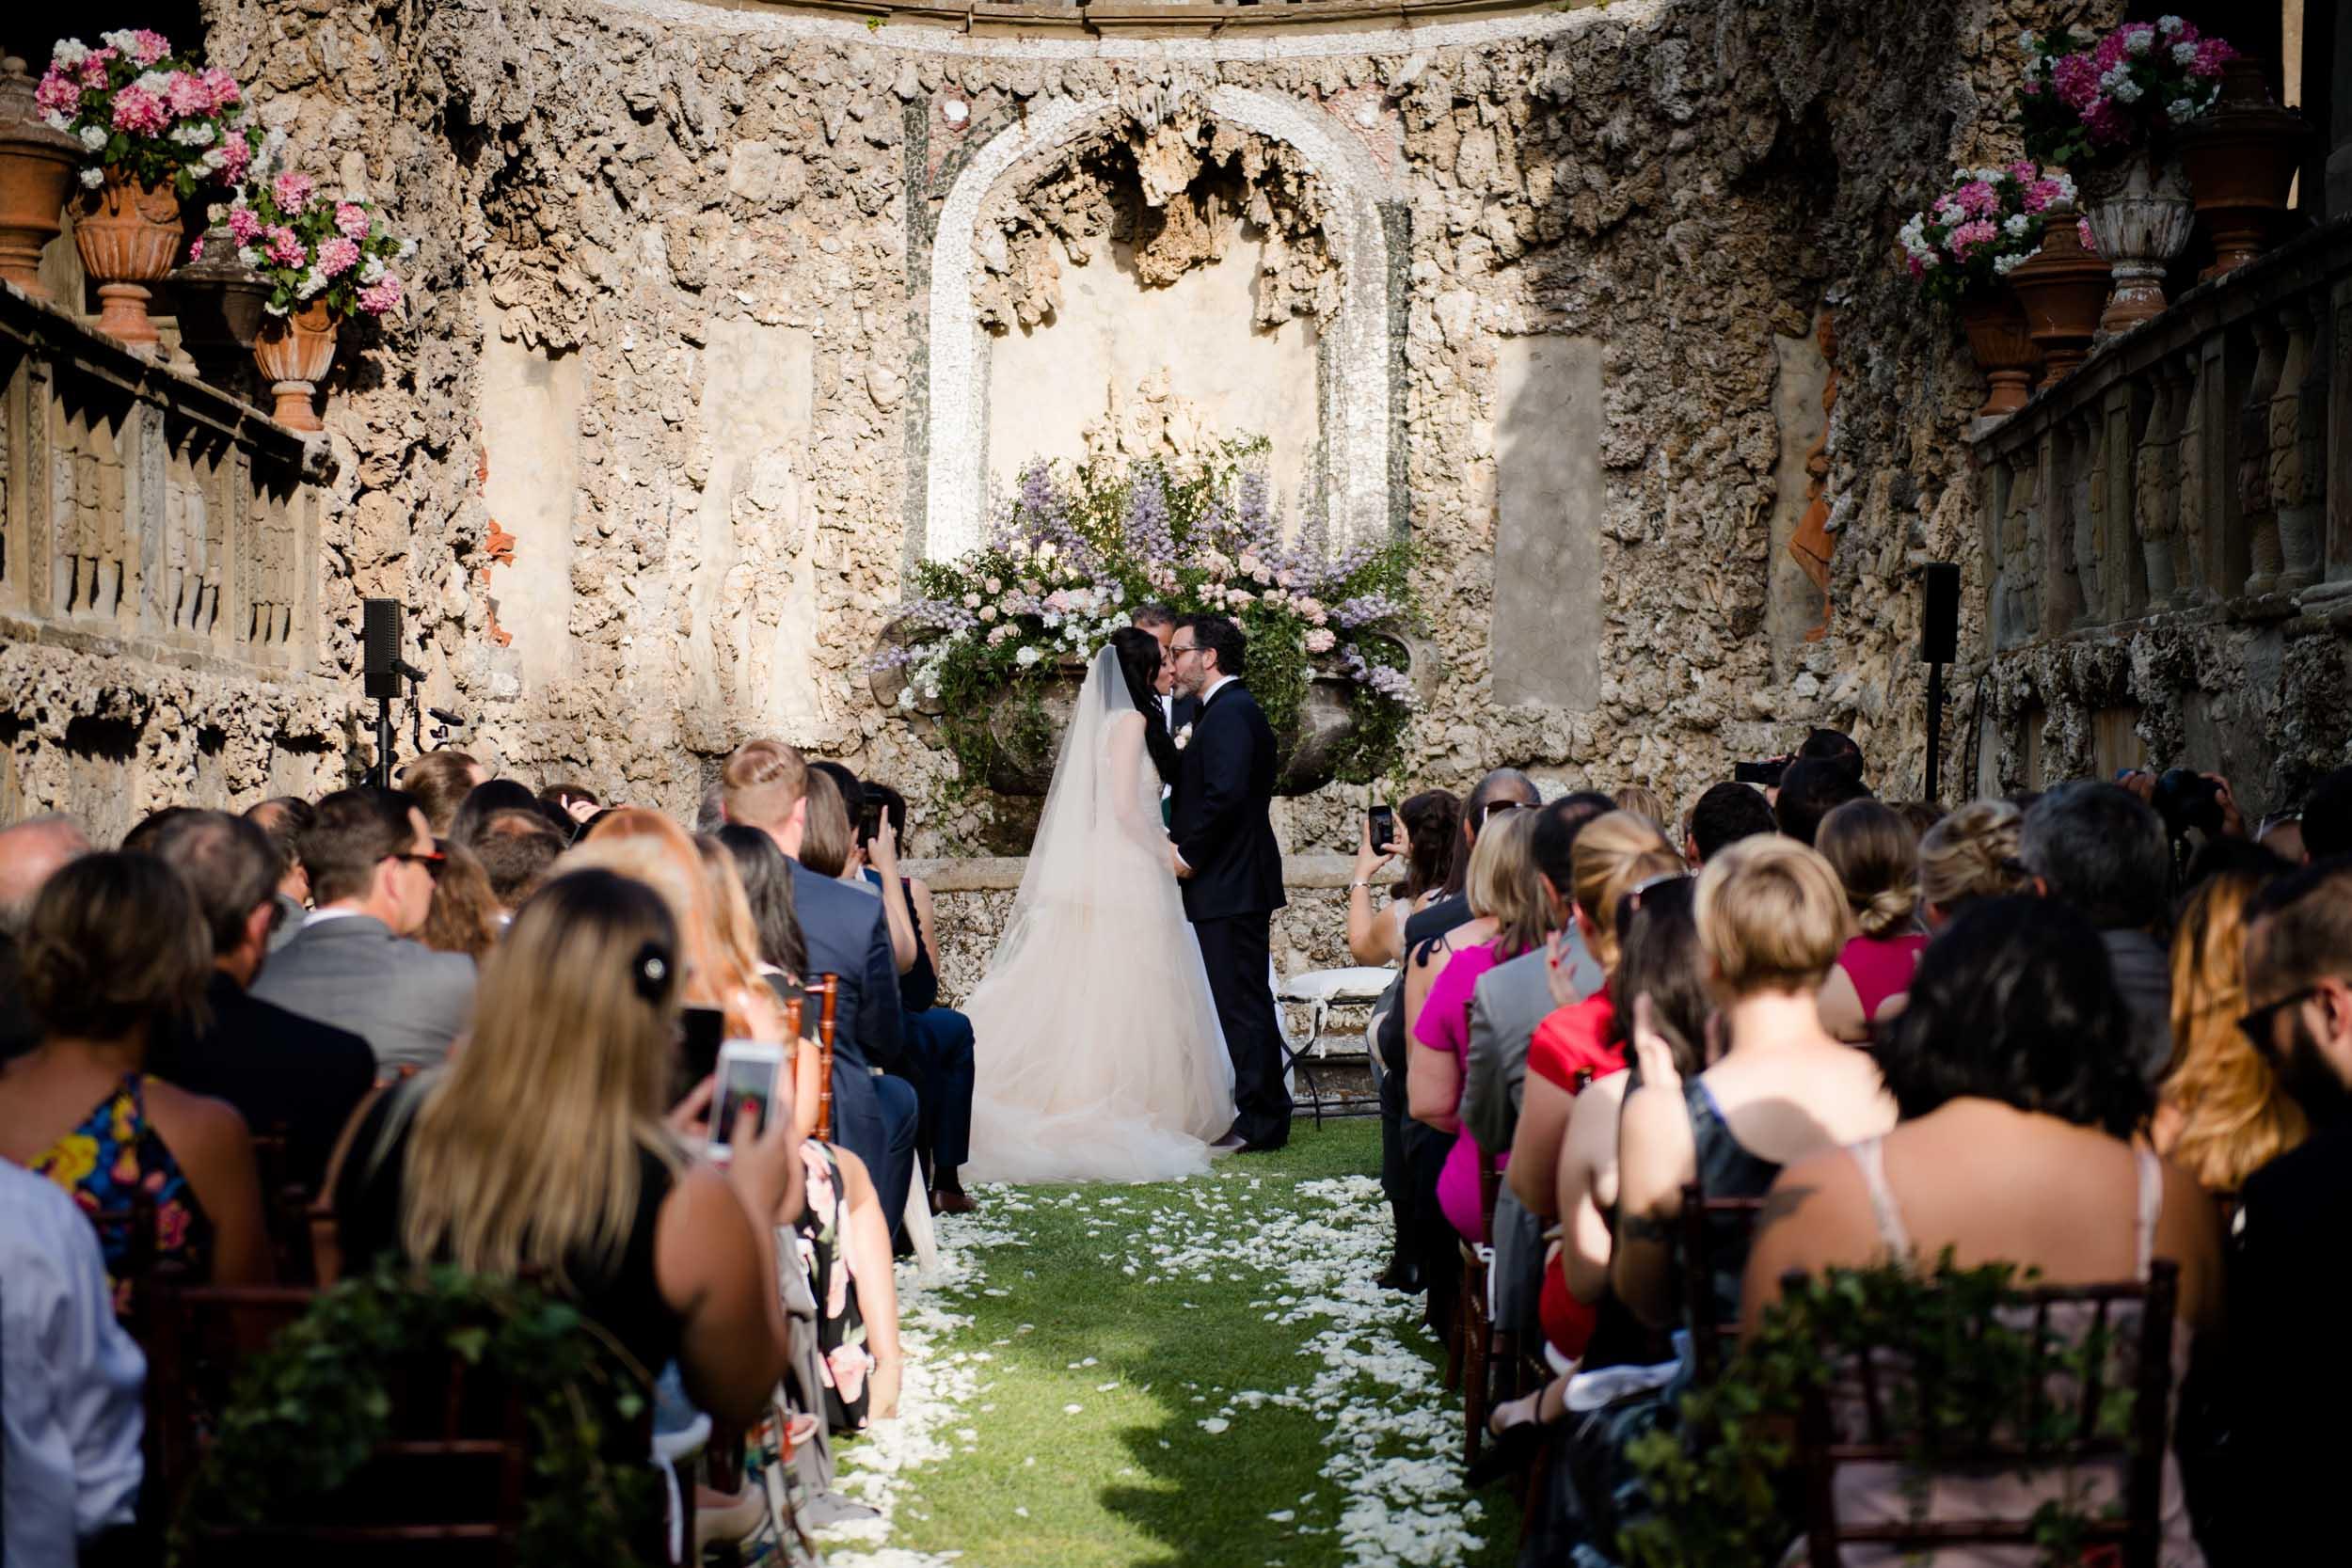 villa-gamberaia-florence-italy-destination-wedding-49.jpg